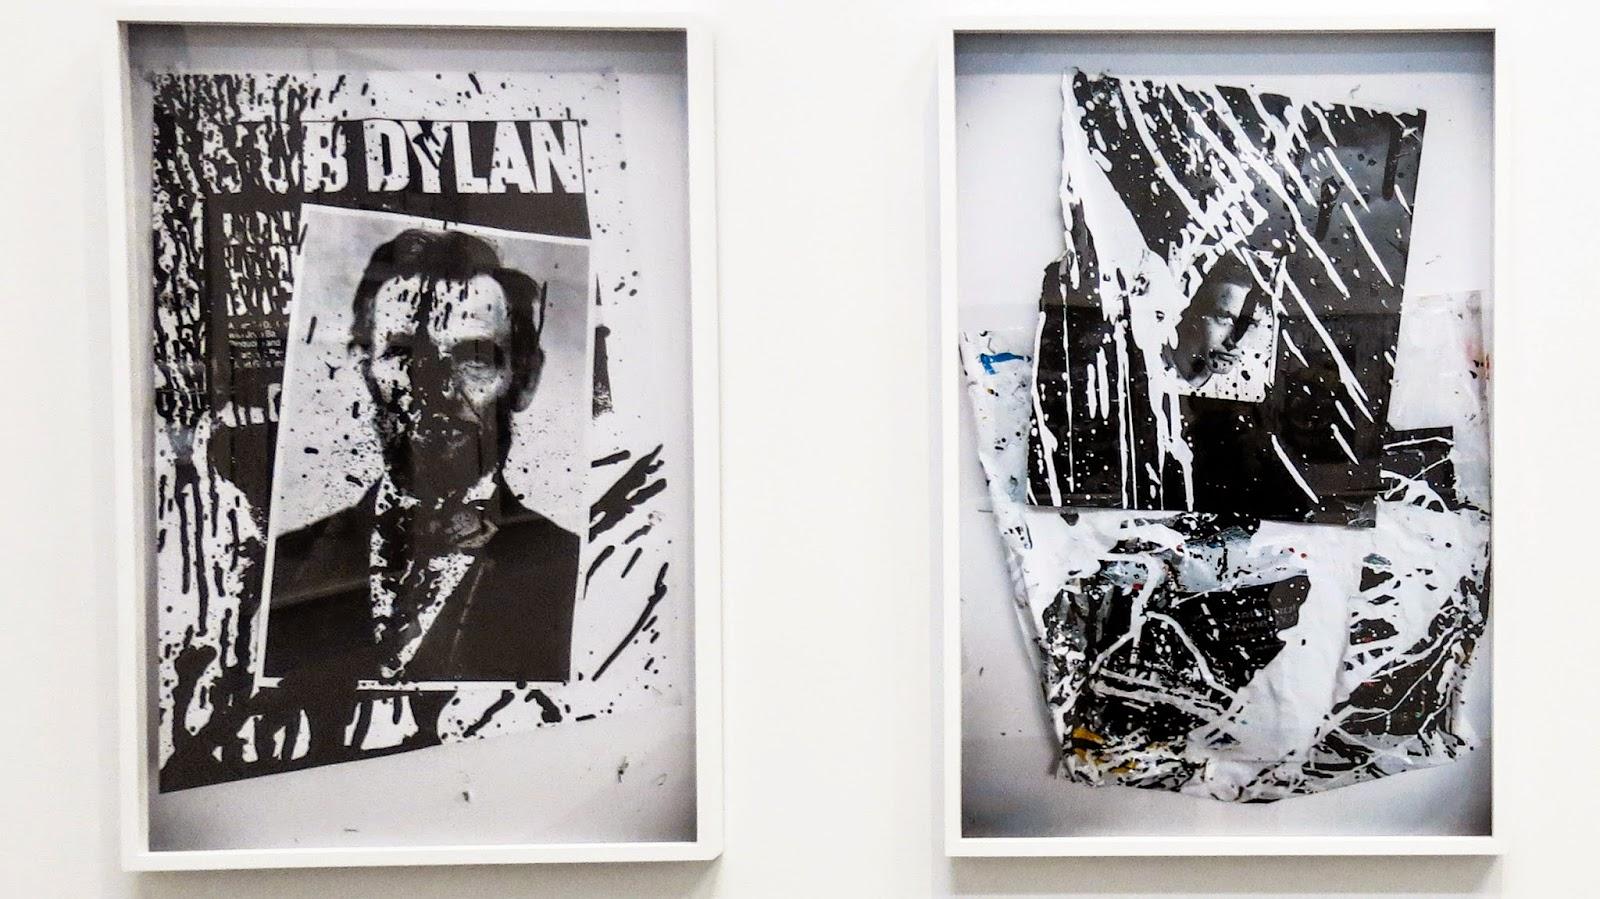 c-prints